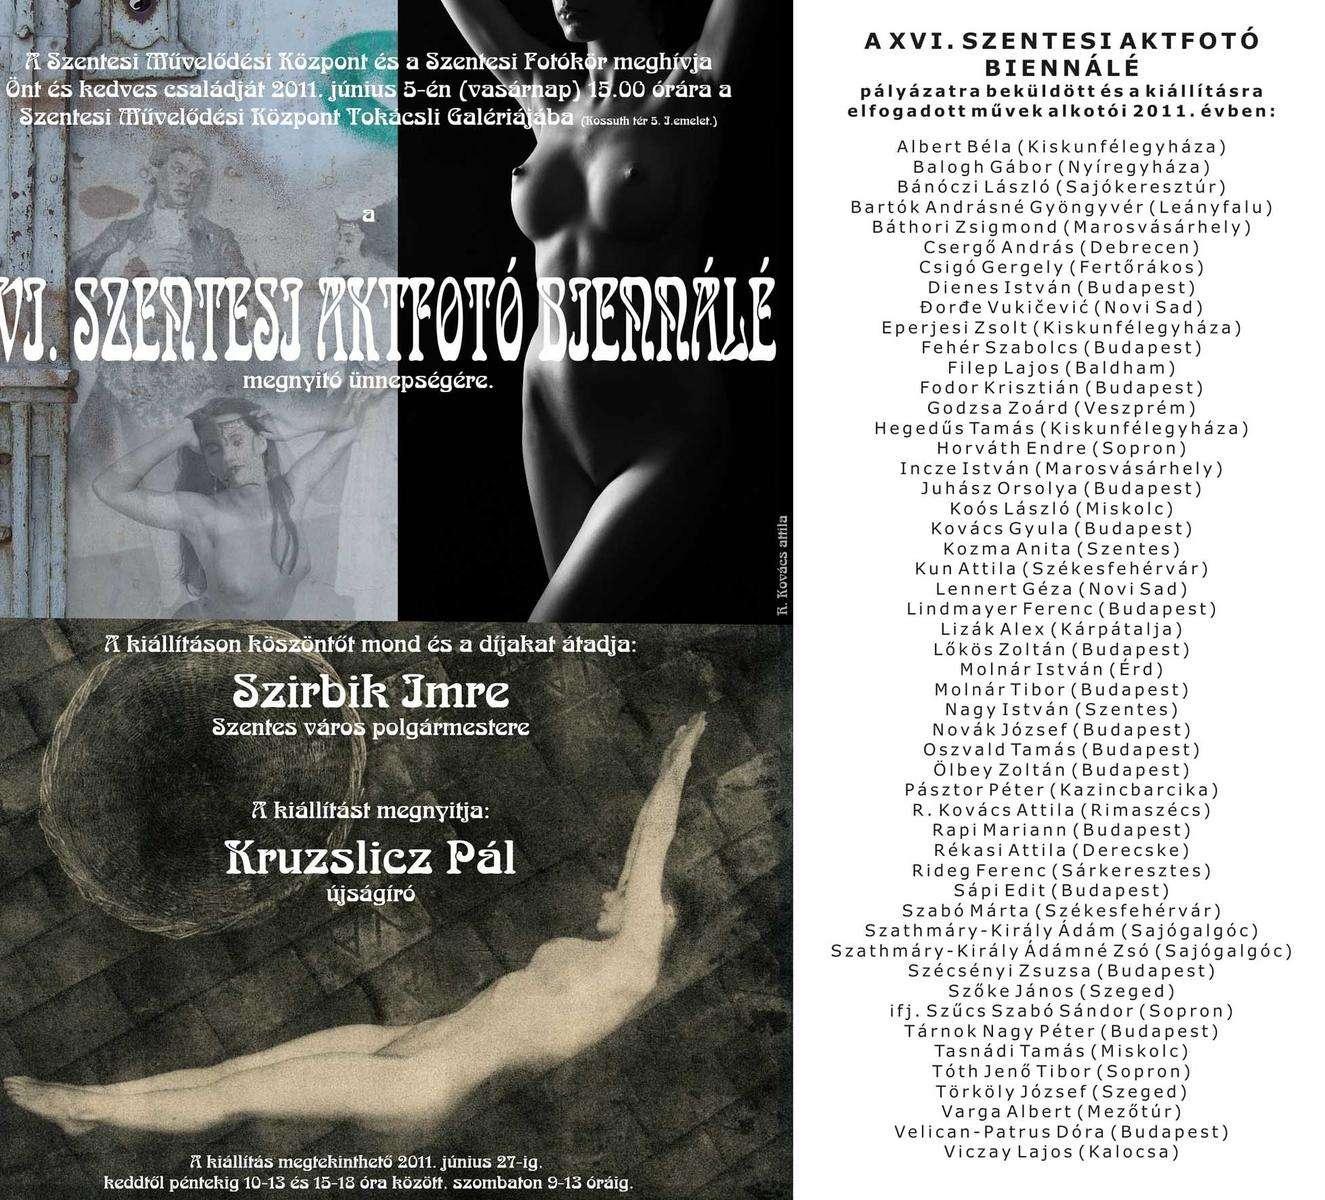 xvi._szentesi_aktfoto_biennale_meghivo_2.jpg